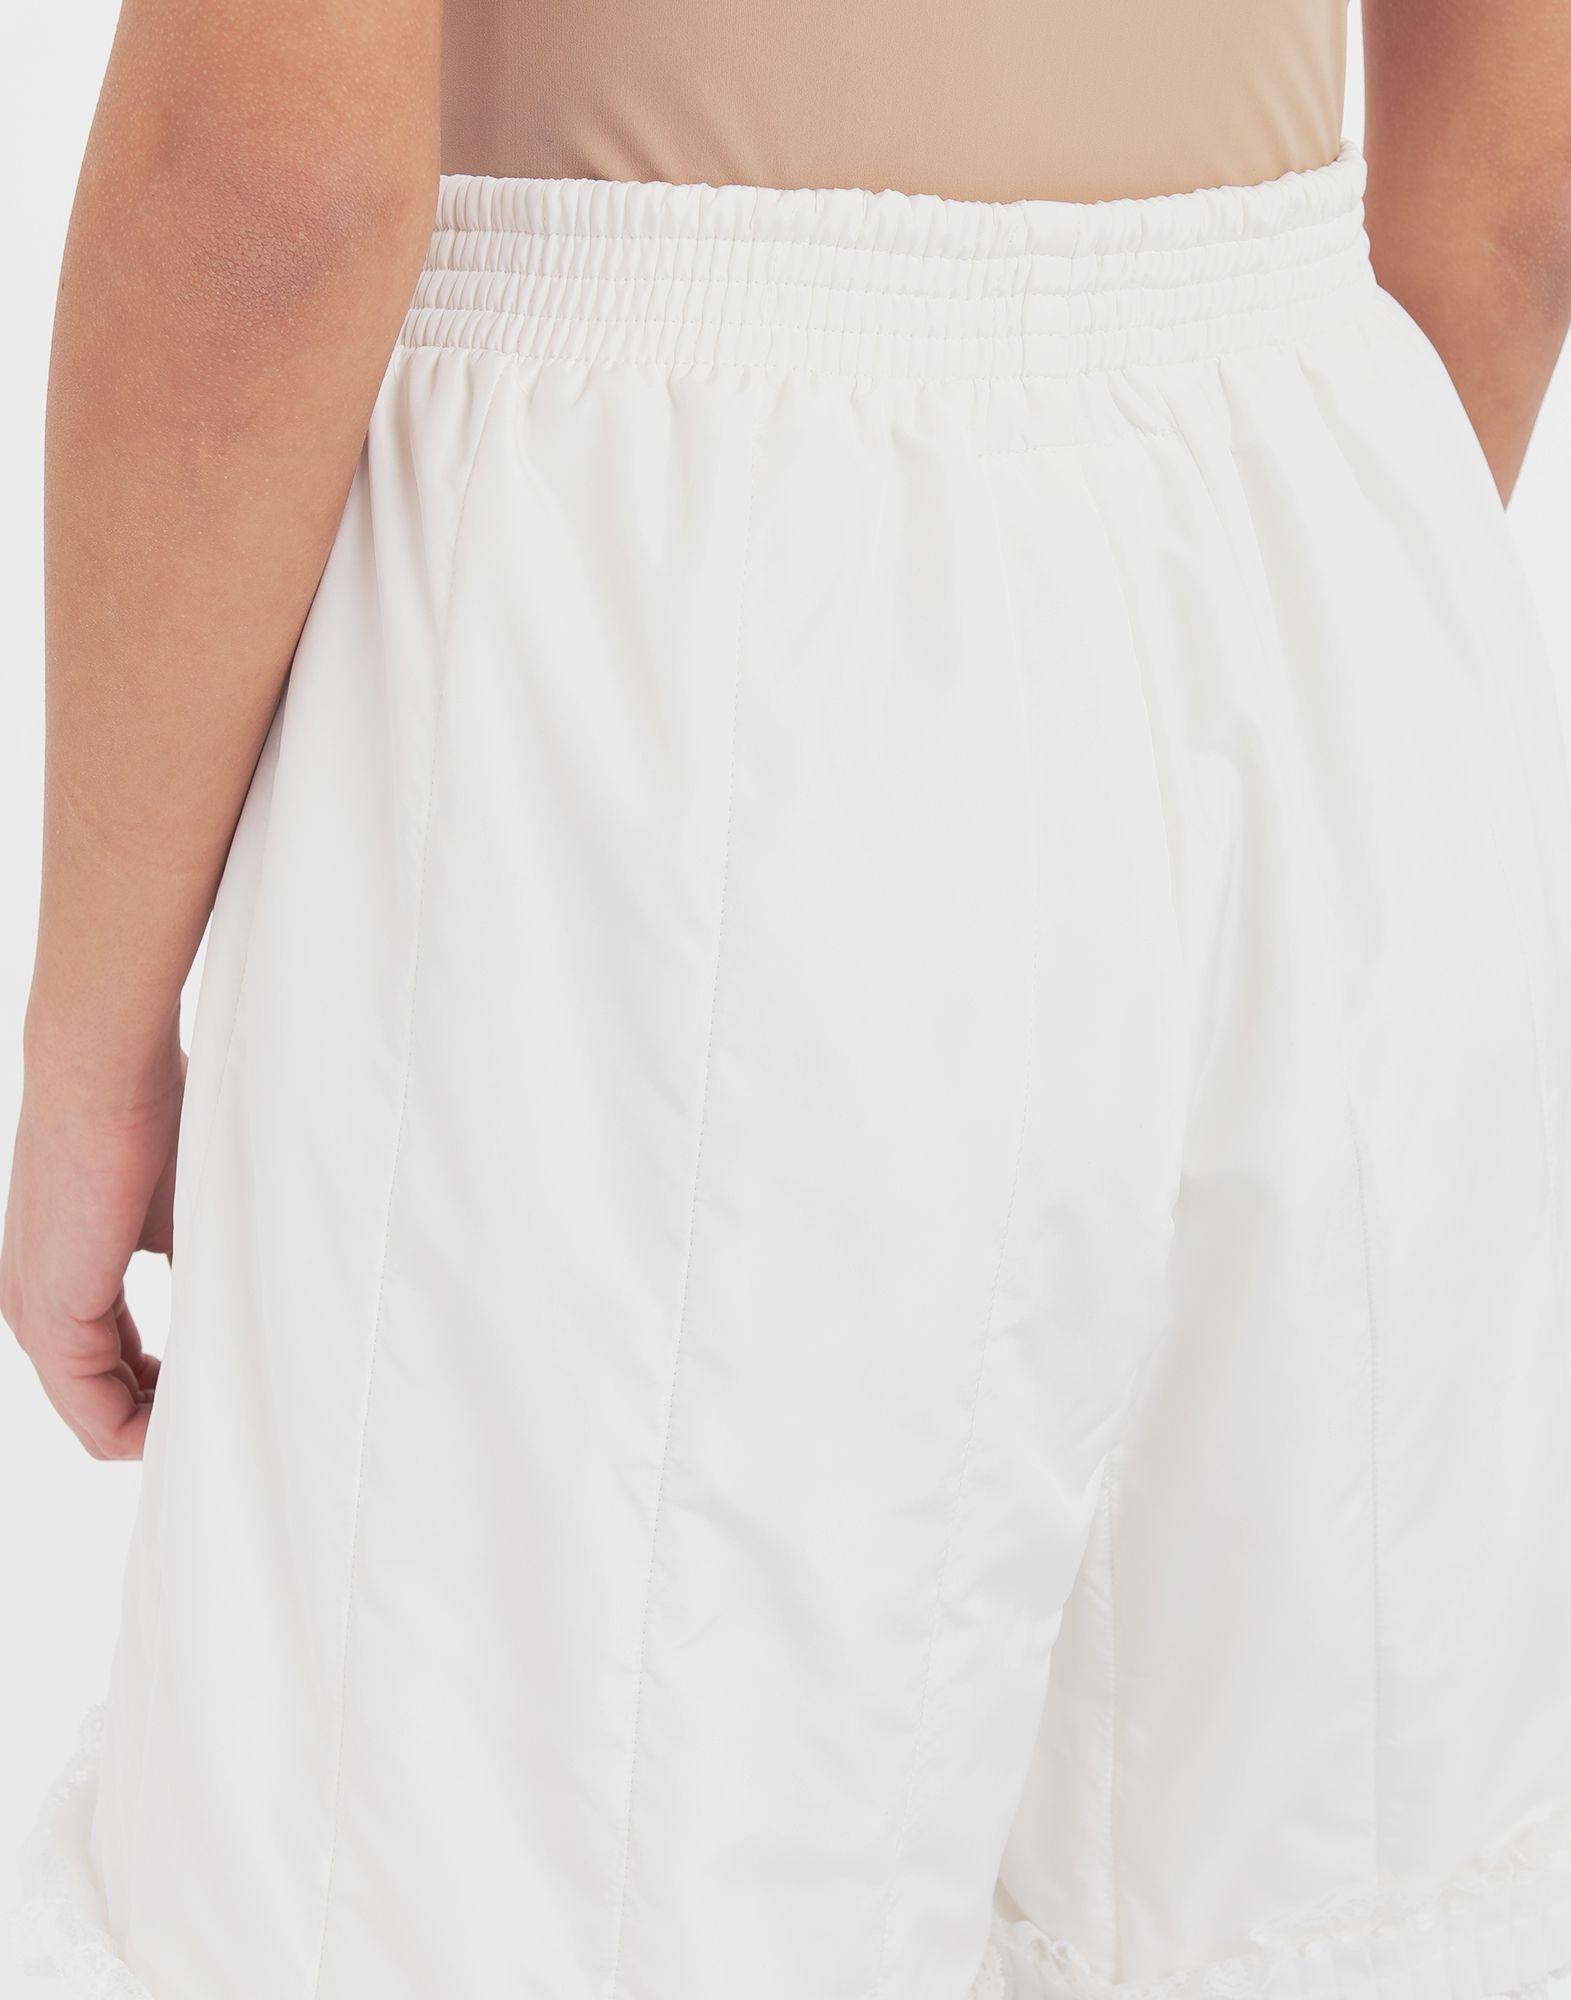 MM6 MAISON MARGIELA Lace-trimmed jersey shorts Shorts Woman b